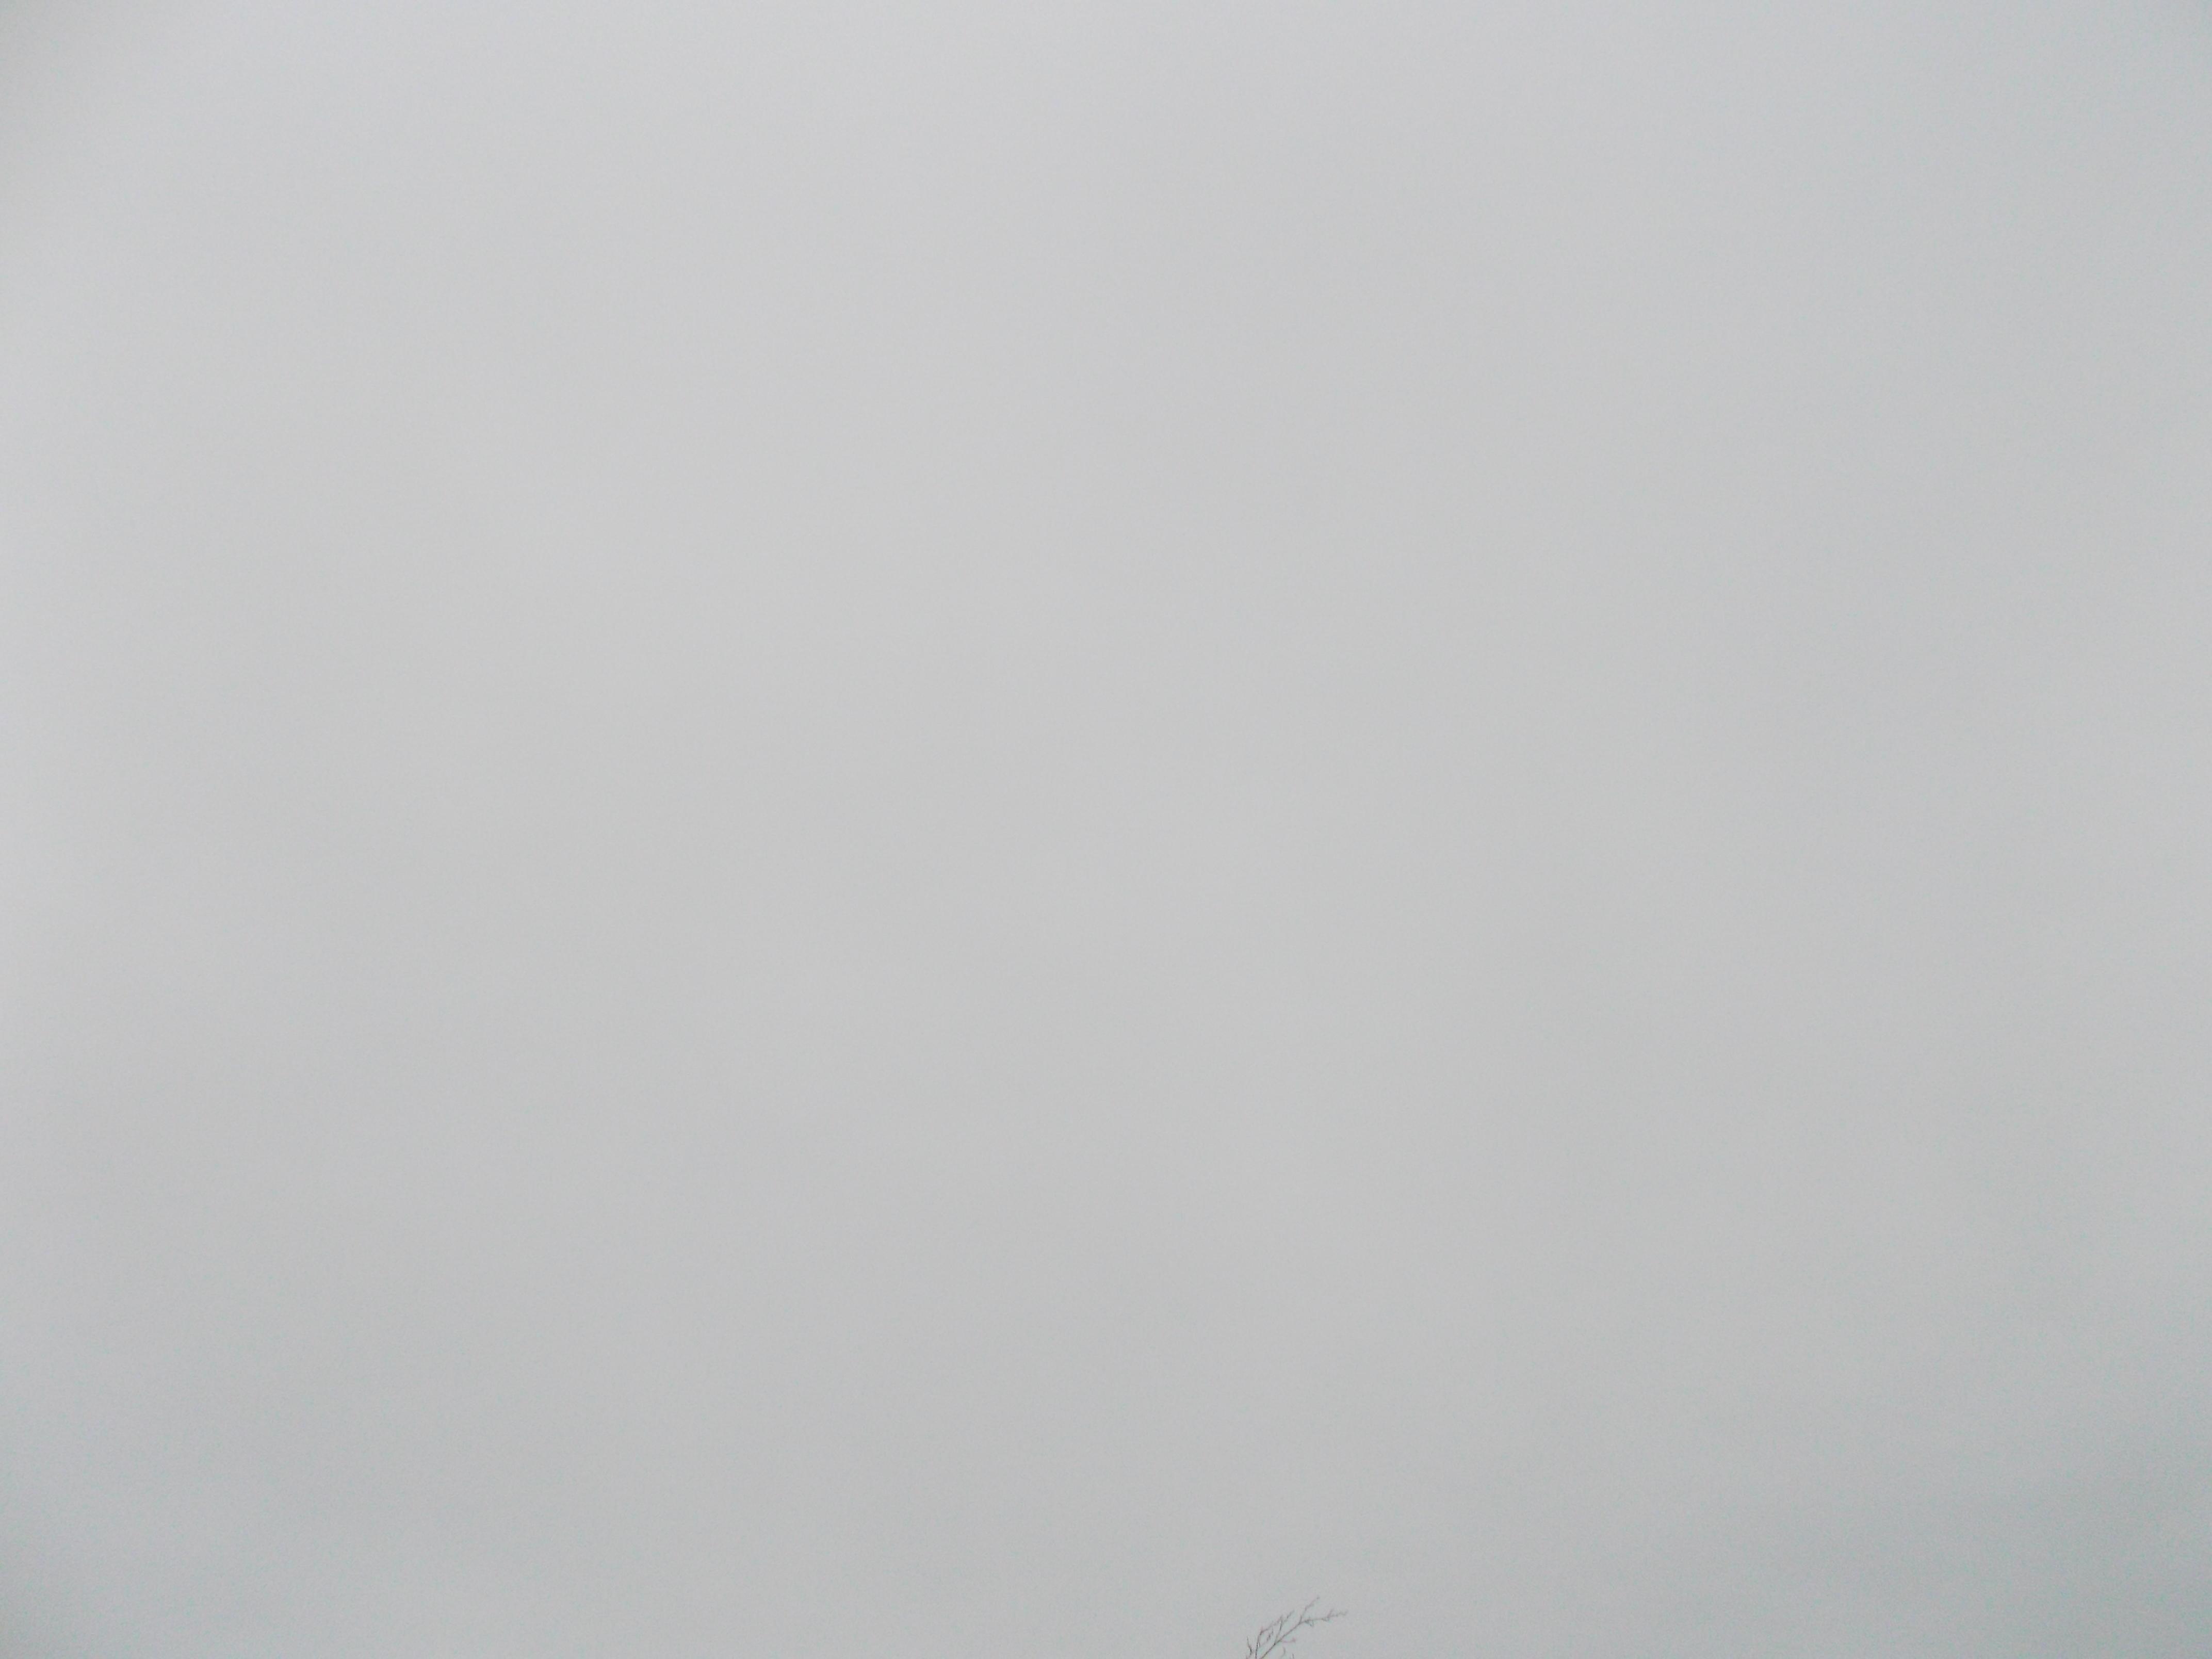 2013-02-03 Longitude -0.371 Latitude 49.182 Altitude 13 Heure 12h56